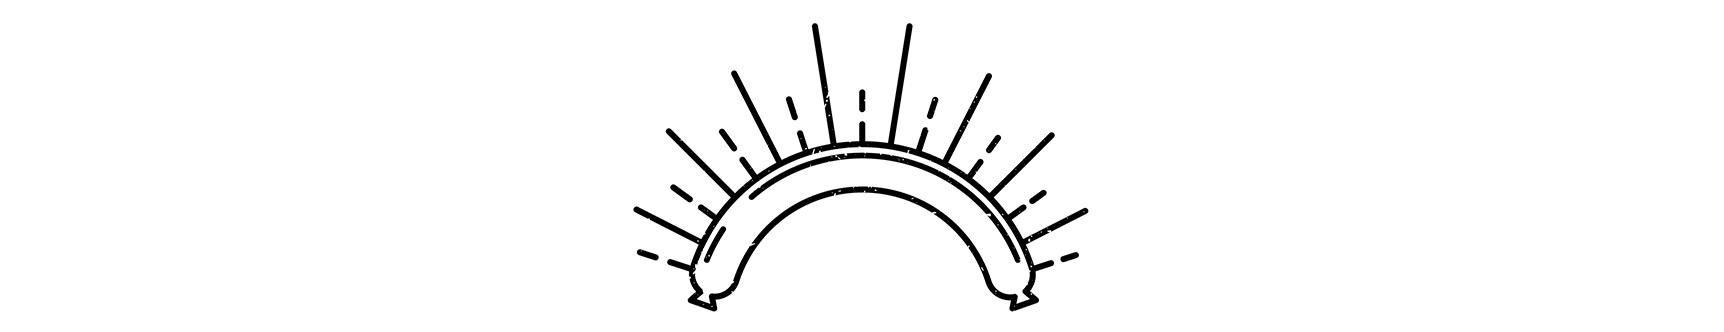 simbol-buti.jpg